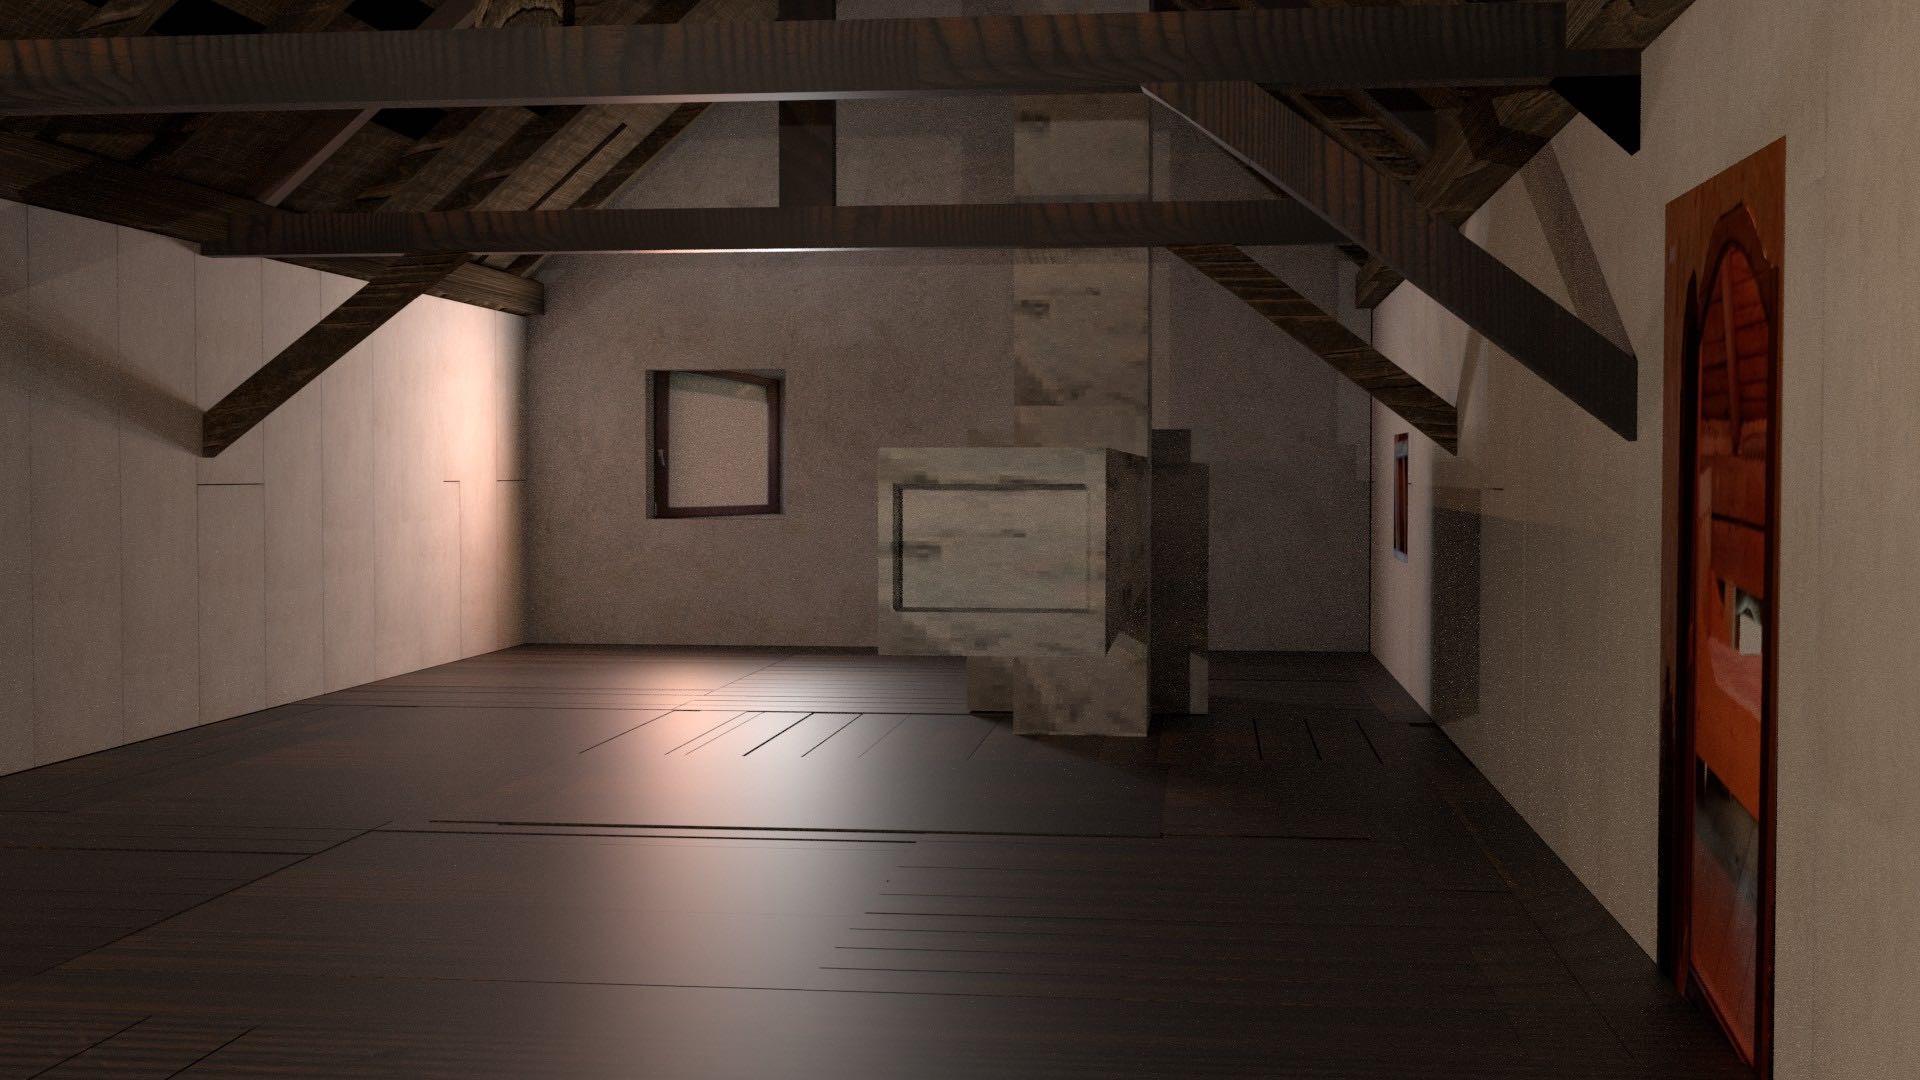 Dachboden 25 k.jpg